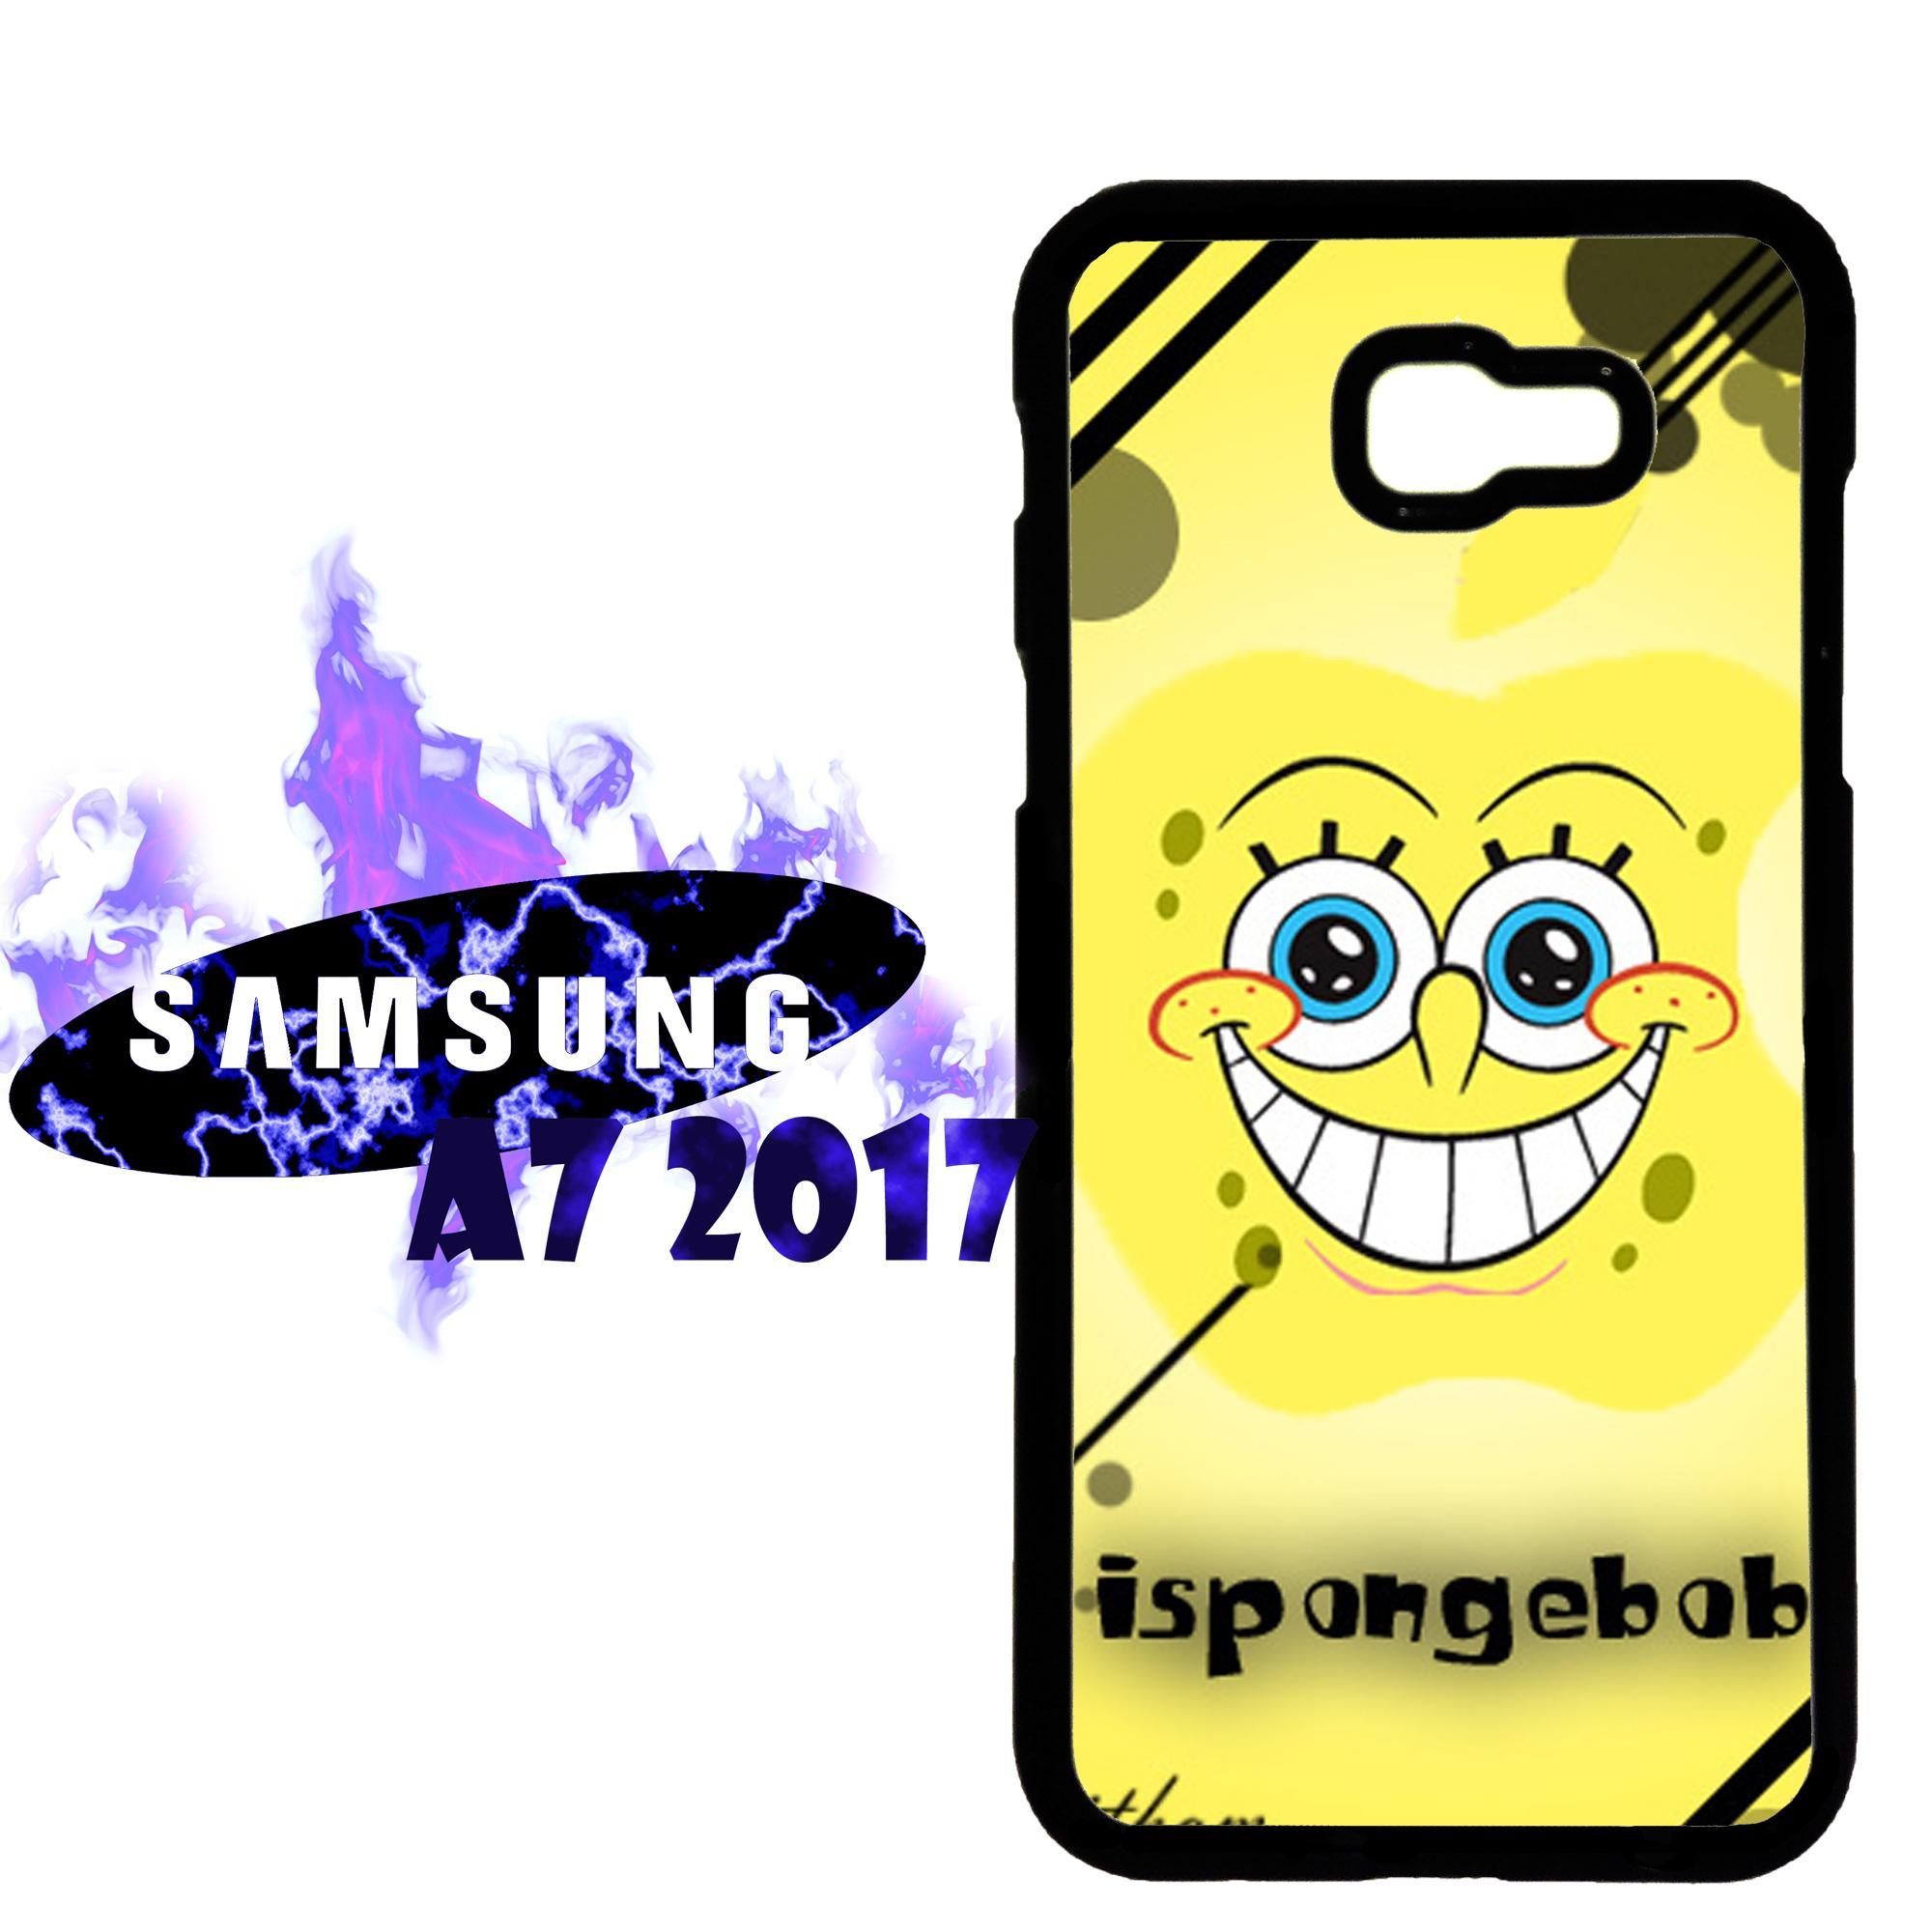 Rajamurah fasion printing case Samsung A7 2017 - 140